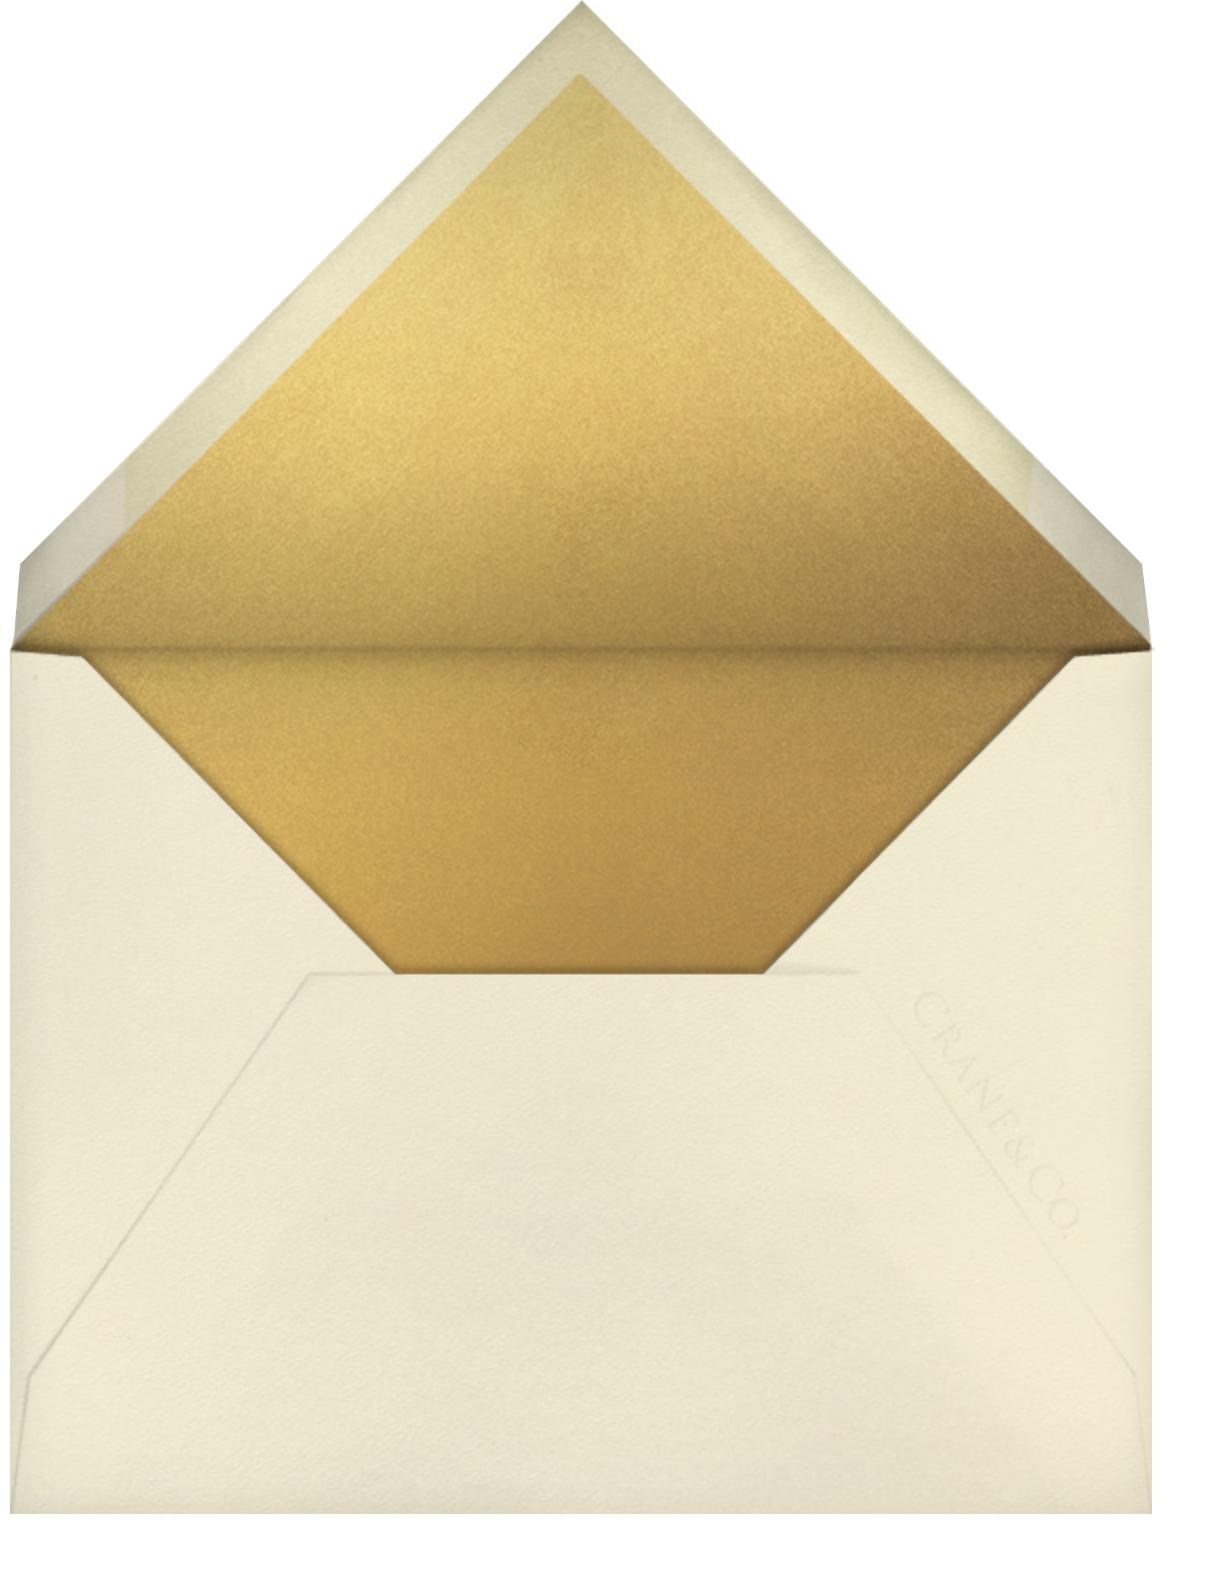 Gala (Save the Date) - Medium Gold - Kelly Wearstler - Modern  - envelope back